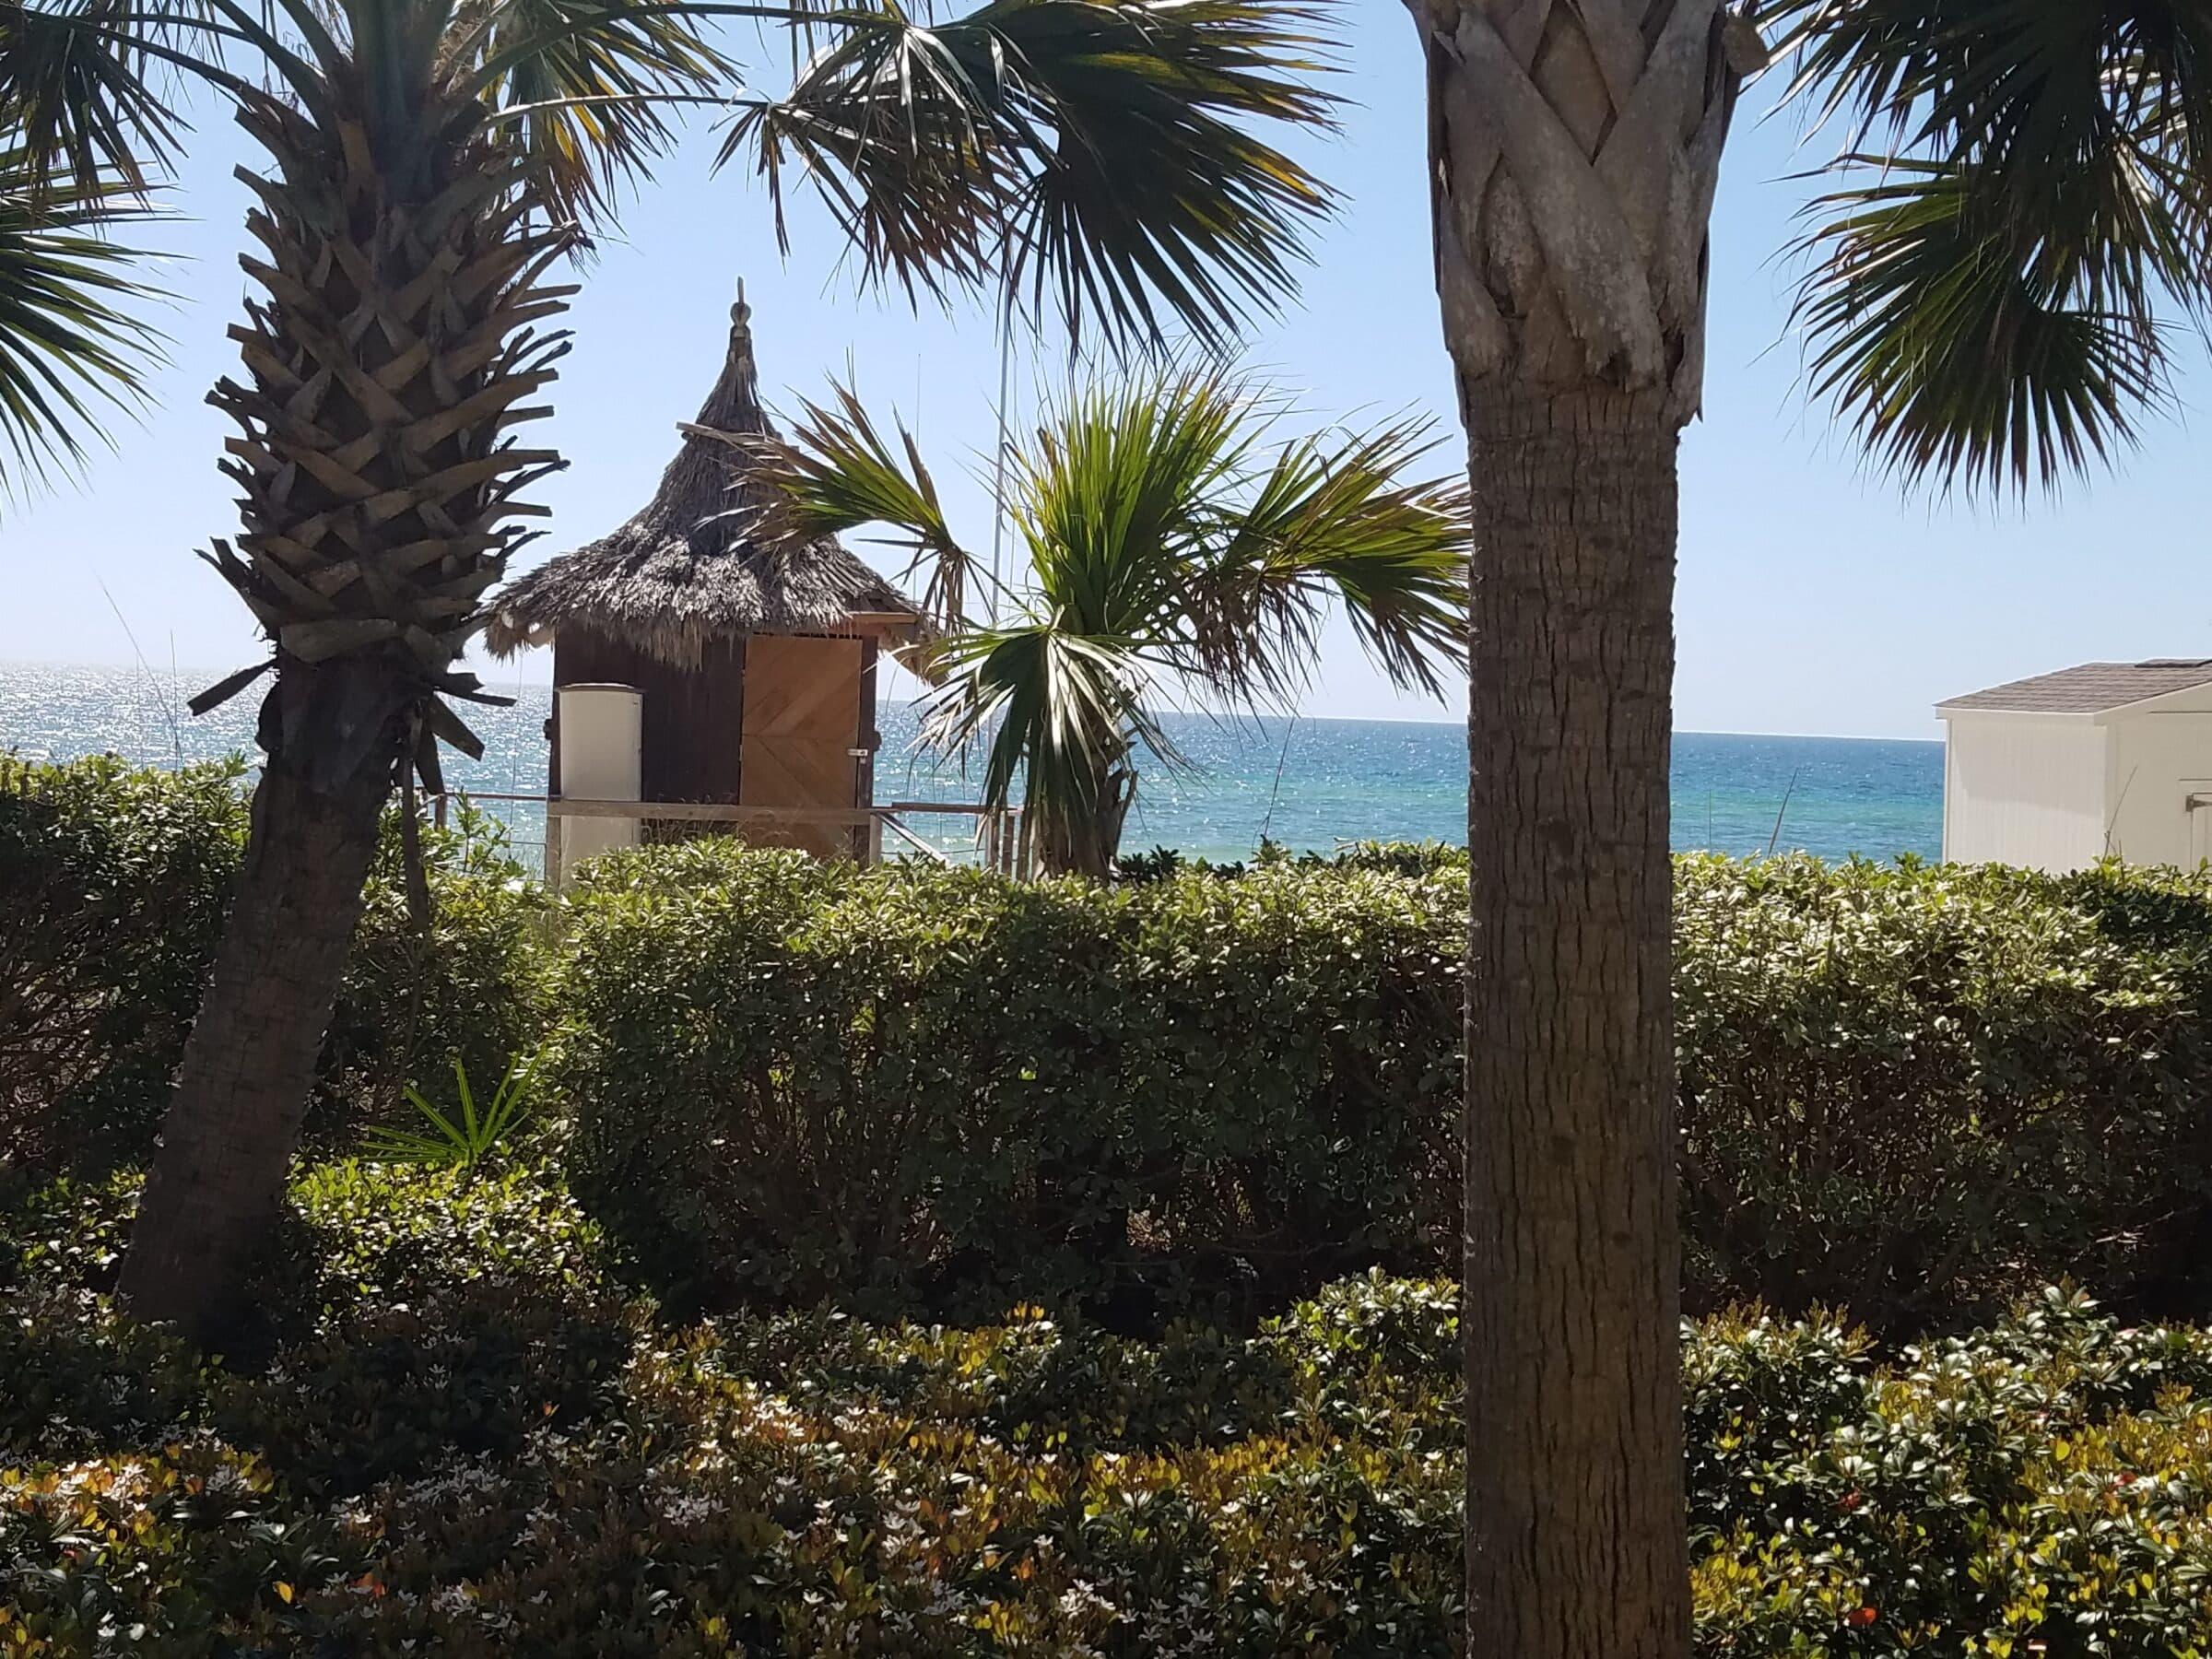 Hair By Kellie - Destin Beach Weddings Location #1 - 13